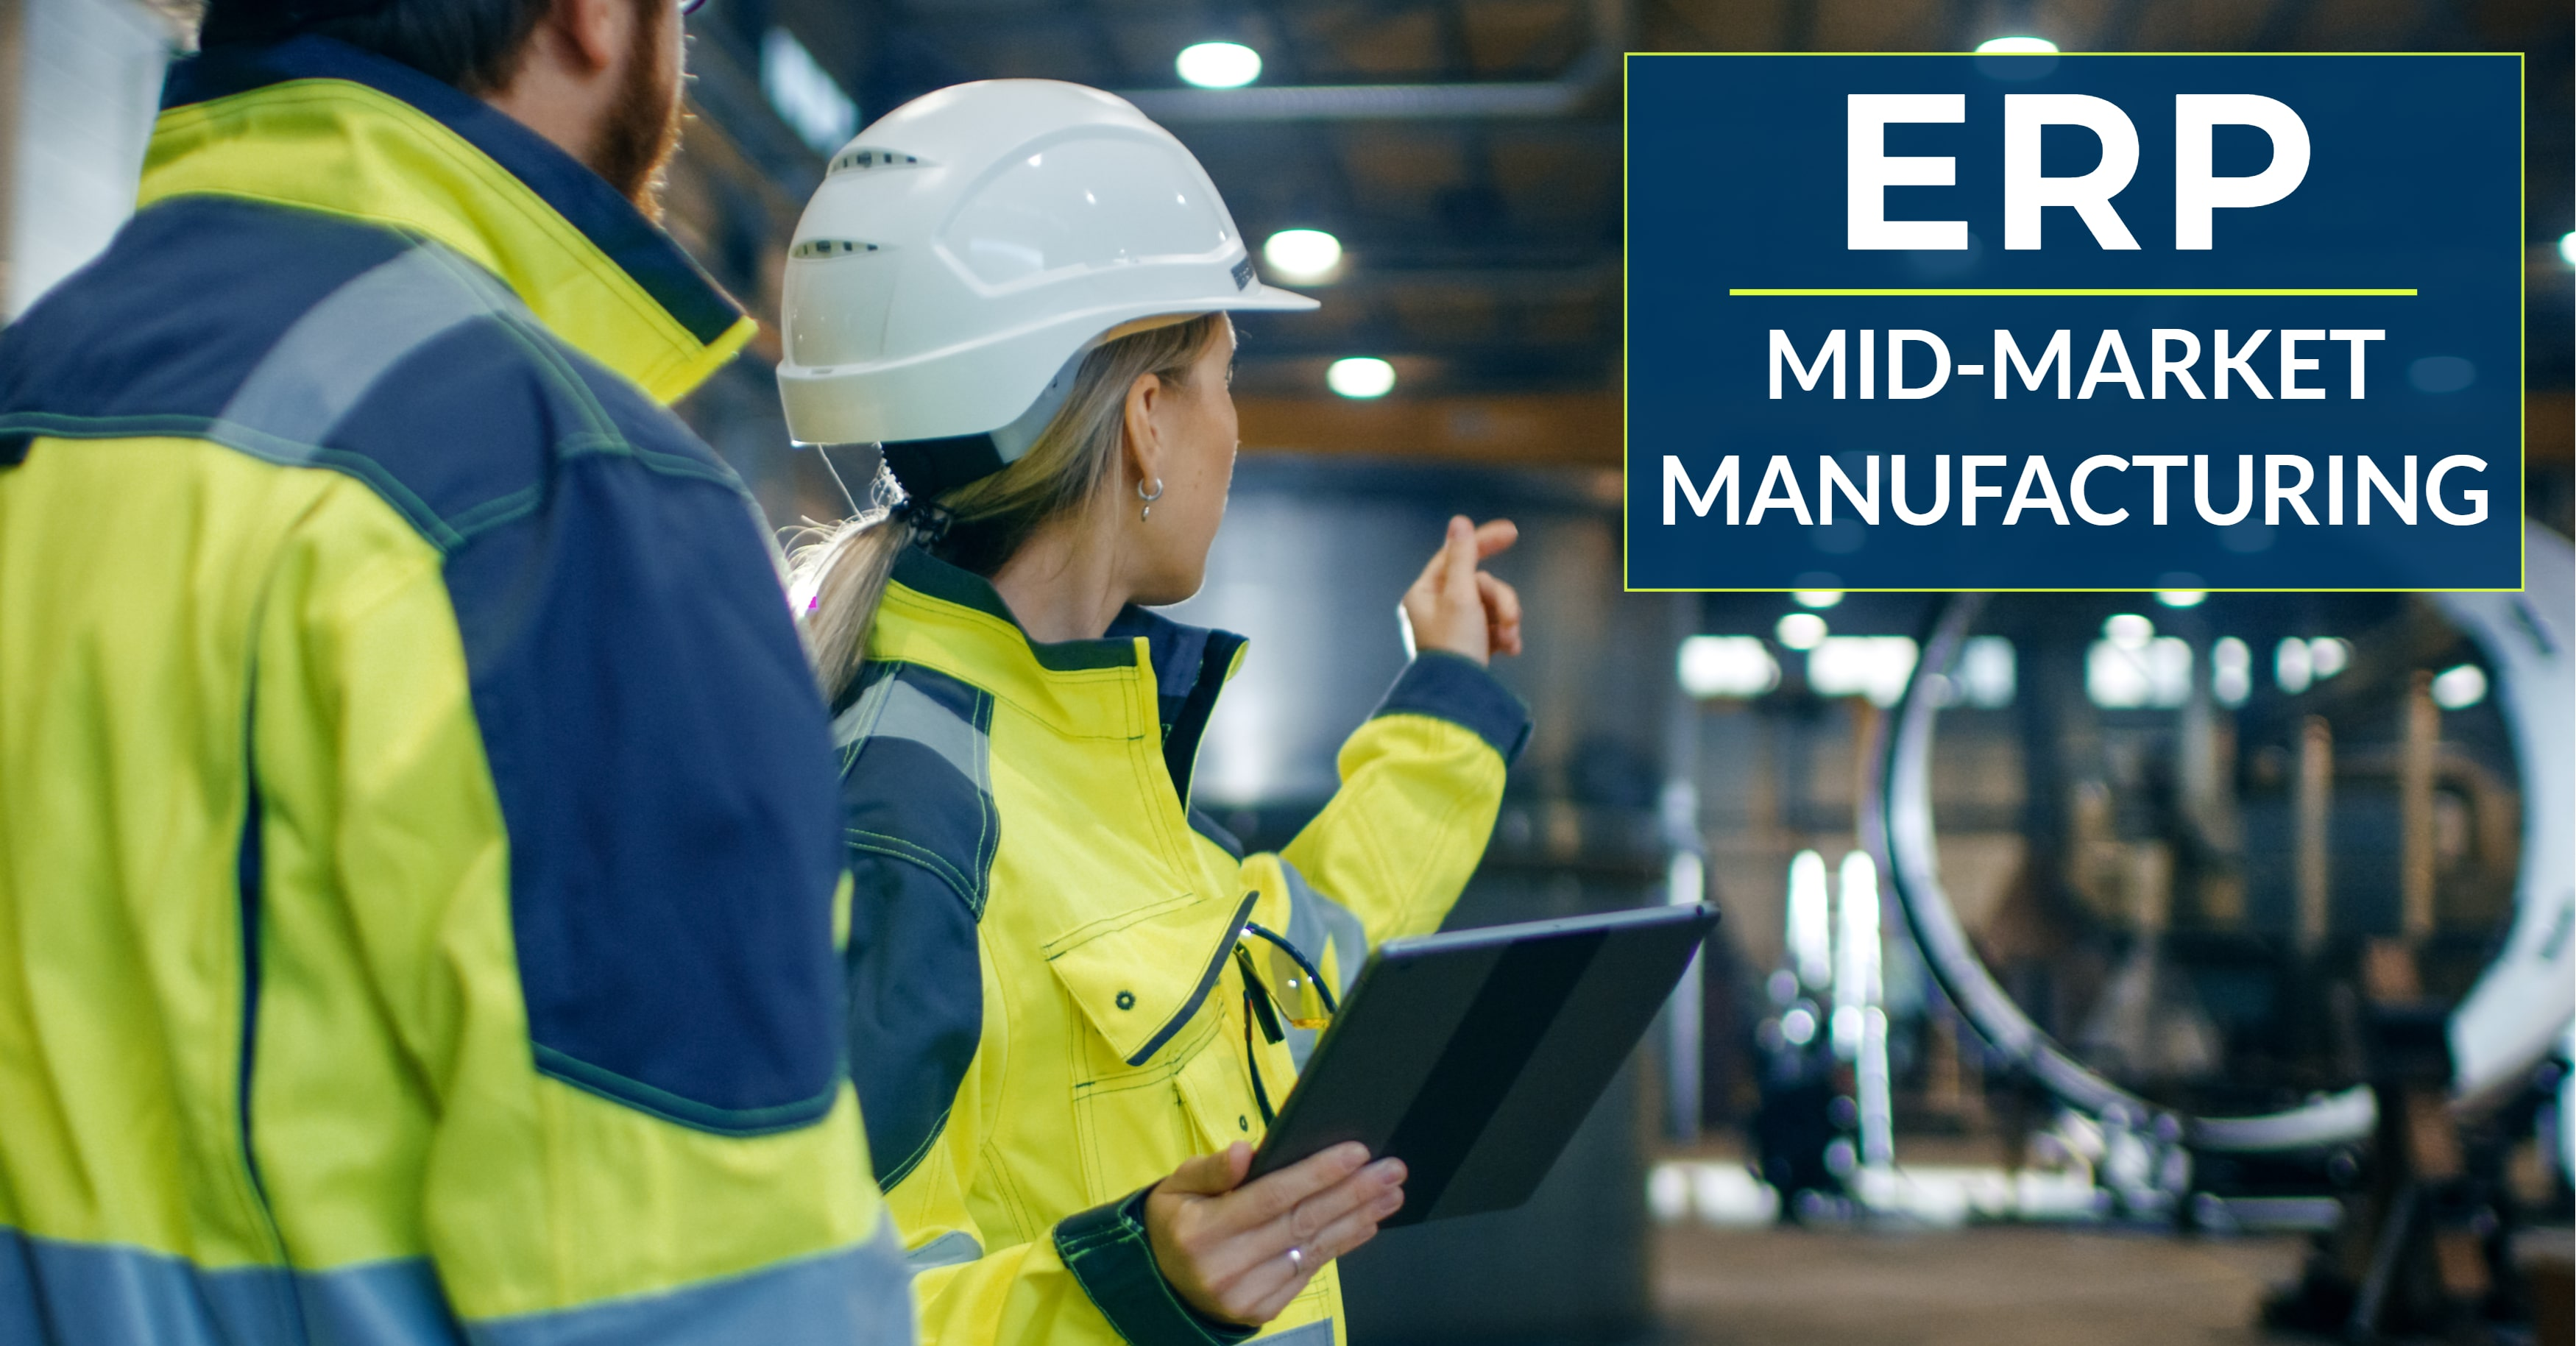 ERP Mid-Market Manufacturing